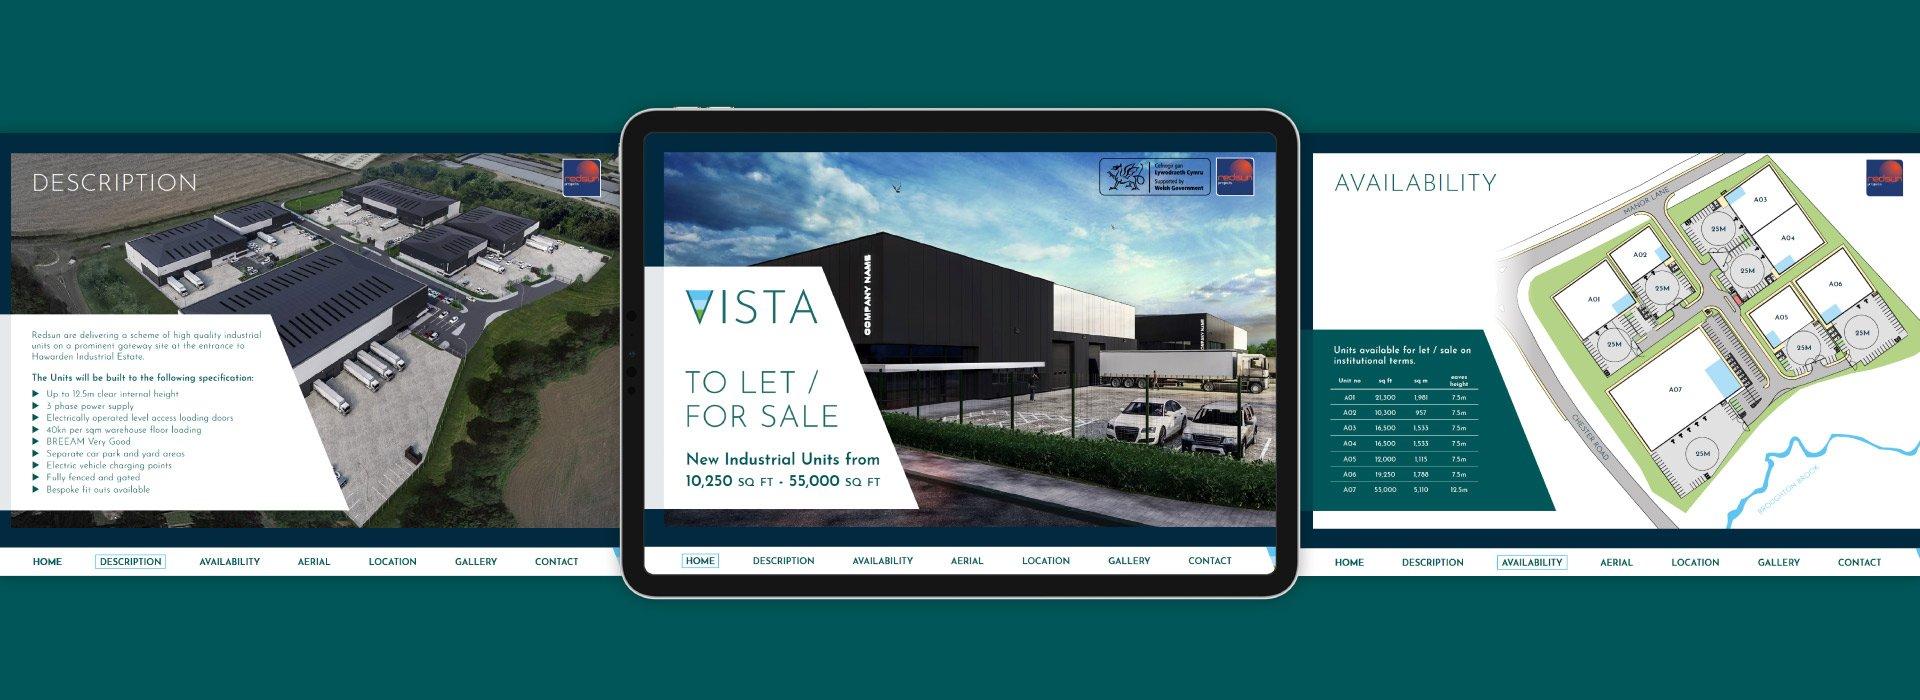 Vista Warehouse & Distribution Property Digital Brochure